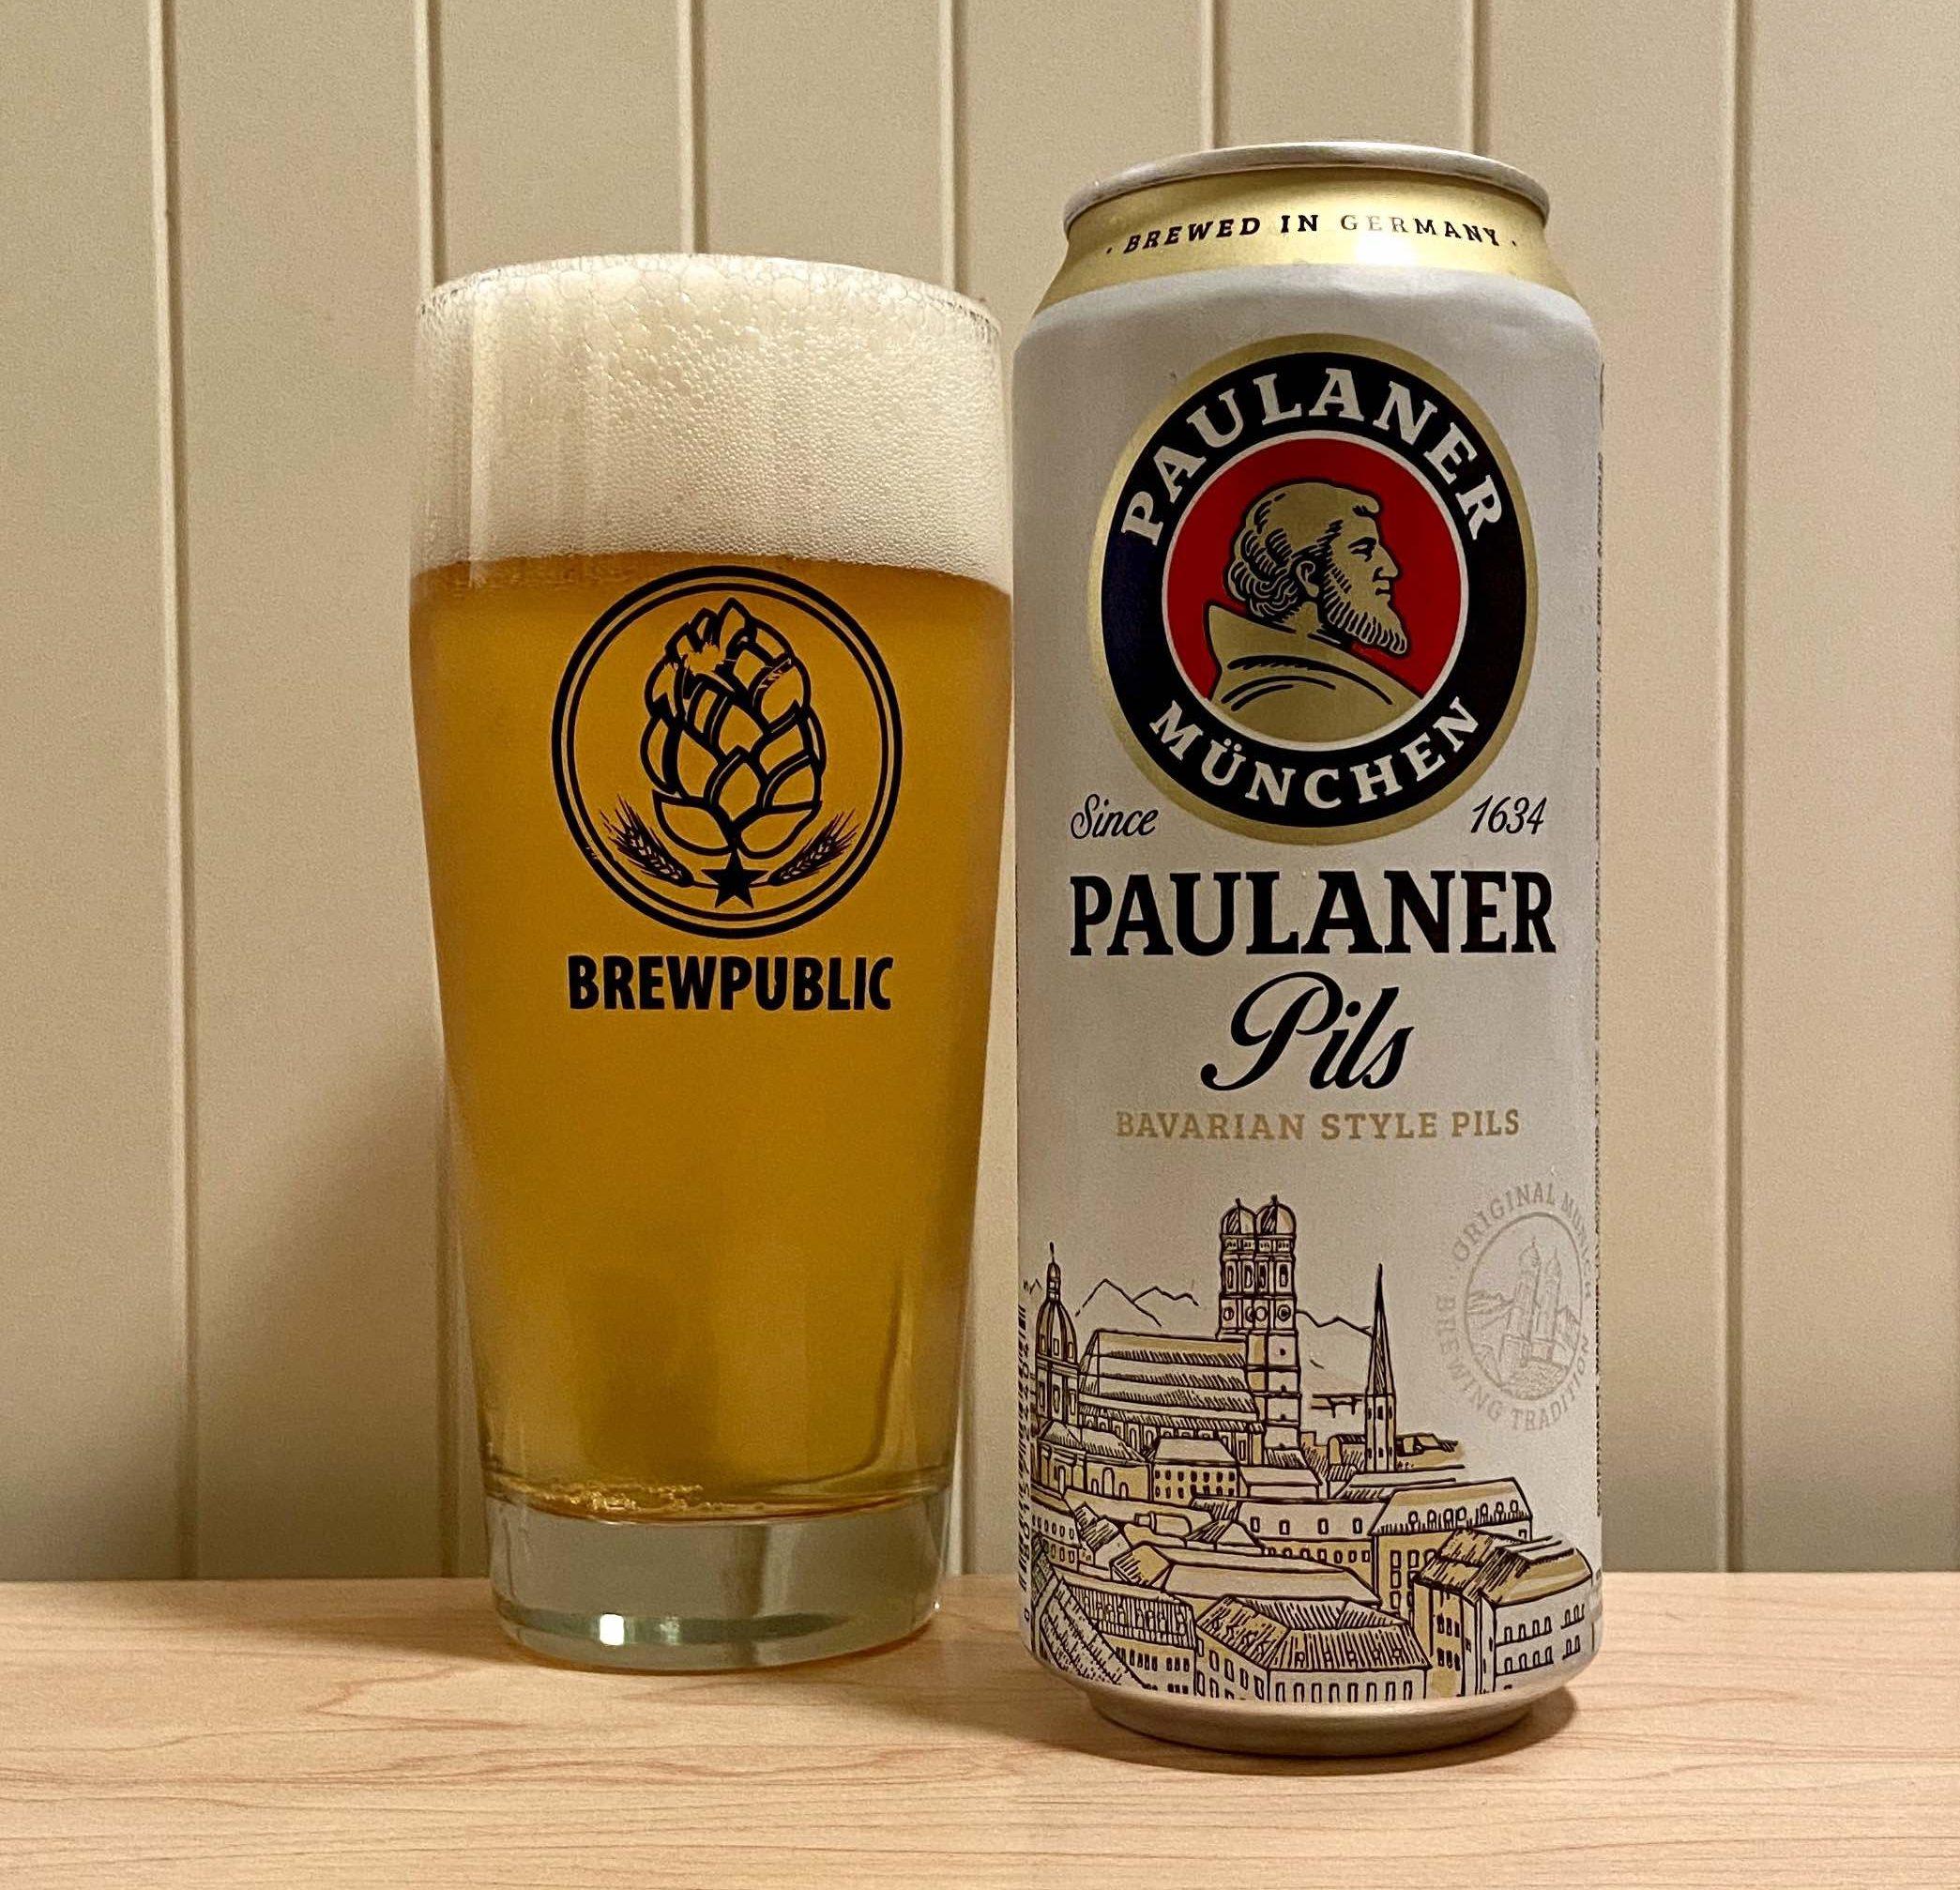 The resurected Paulaner Pils served in a BREWPUBLIC Willi Becher beer glass.